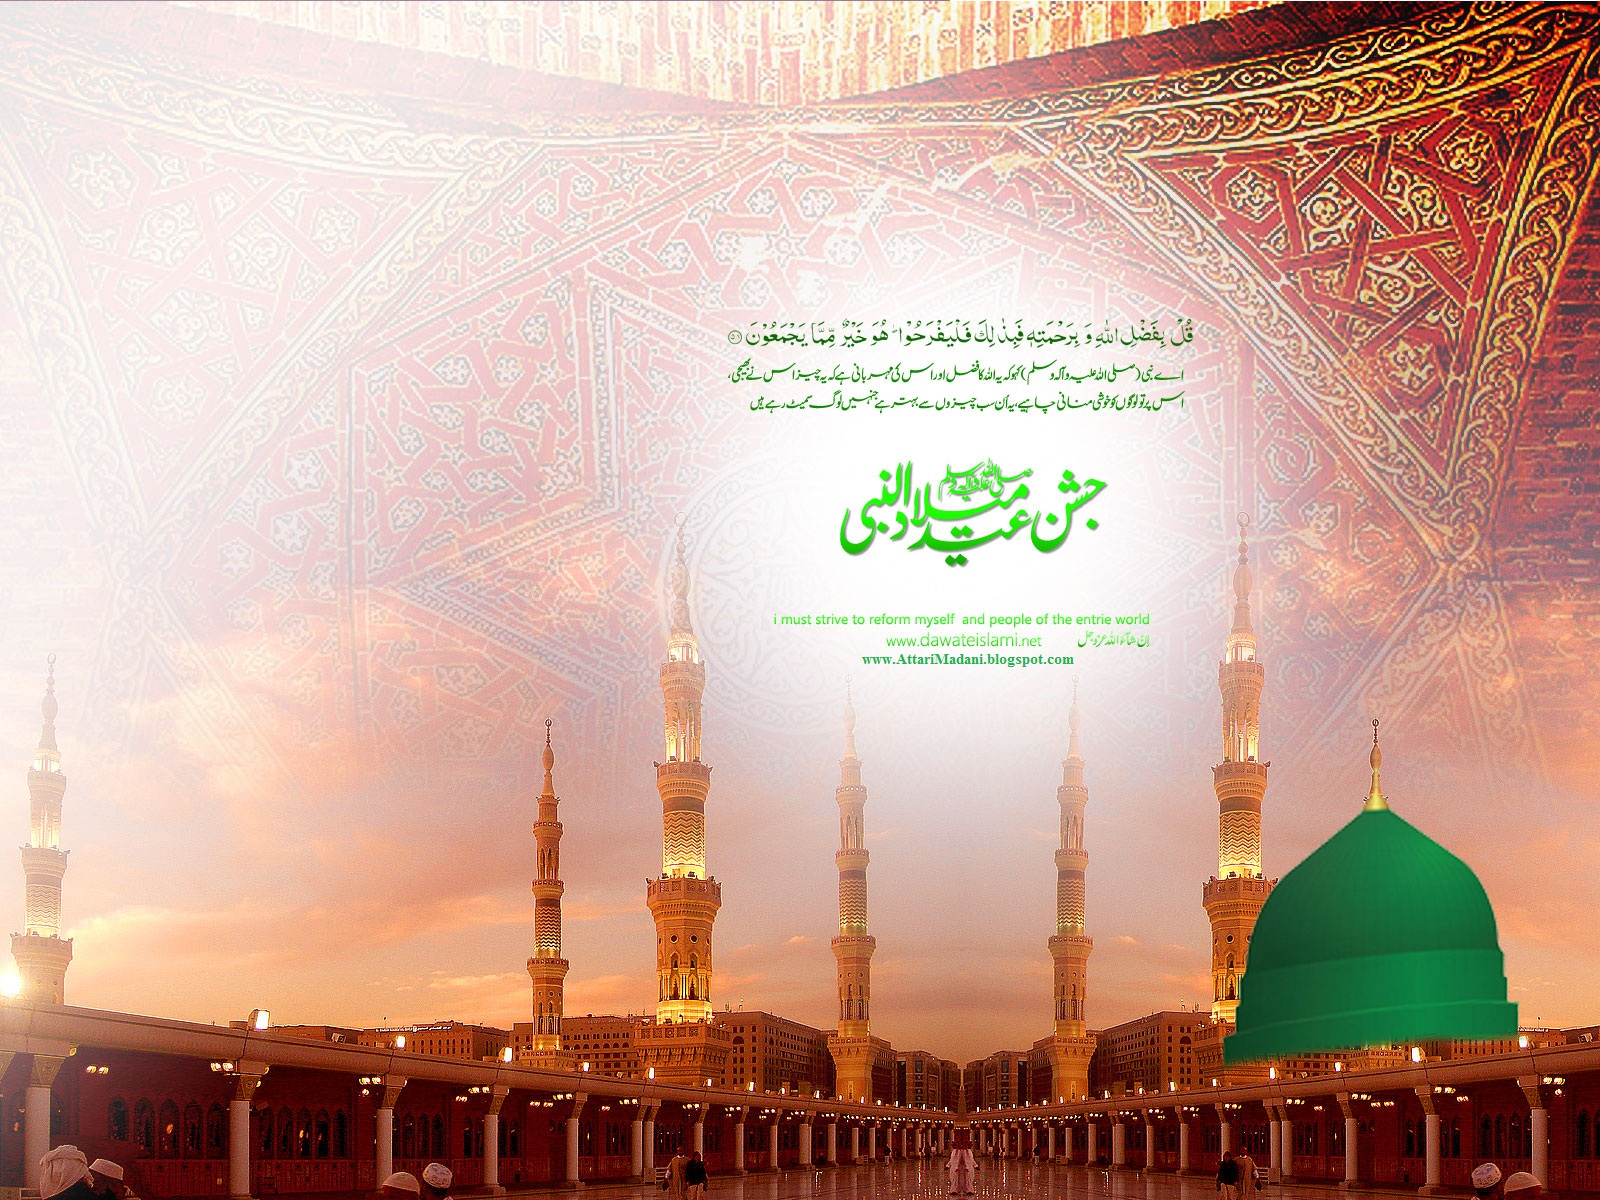 http://3.bp.blogspot.com/-H6He0YIXFoE/Tx7x3WbplRI/AAAAAAAAA7Q/JI73V32v0zg/s1600/jashn_e_eid_milad_un_nabi_wallpaper_by_dawat_e_islami-7.jpg